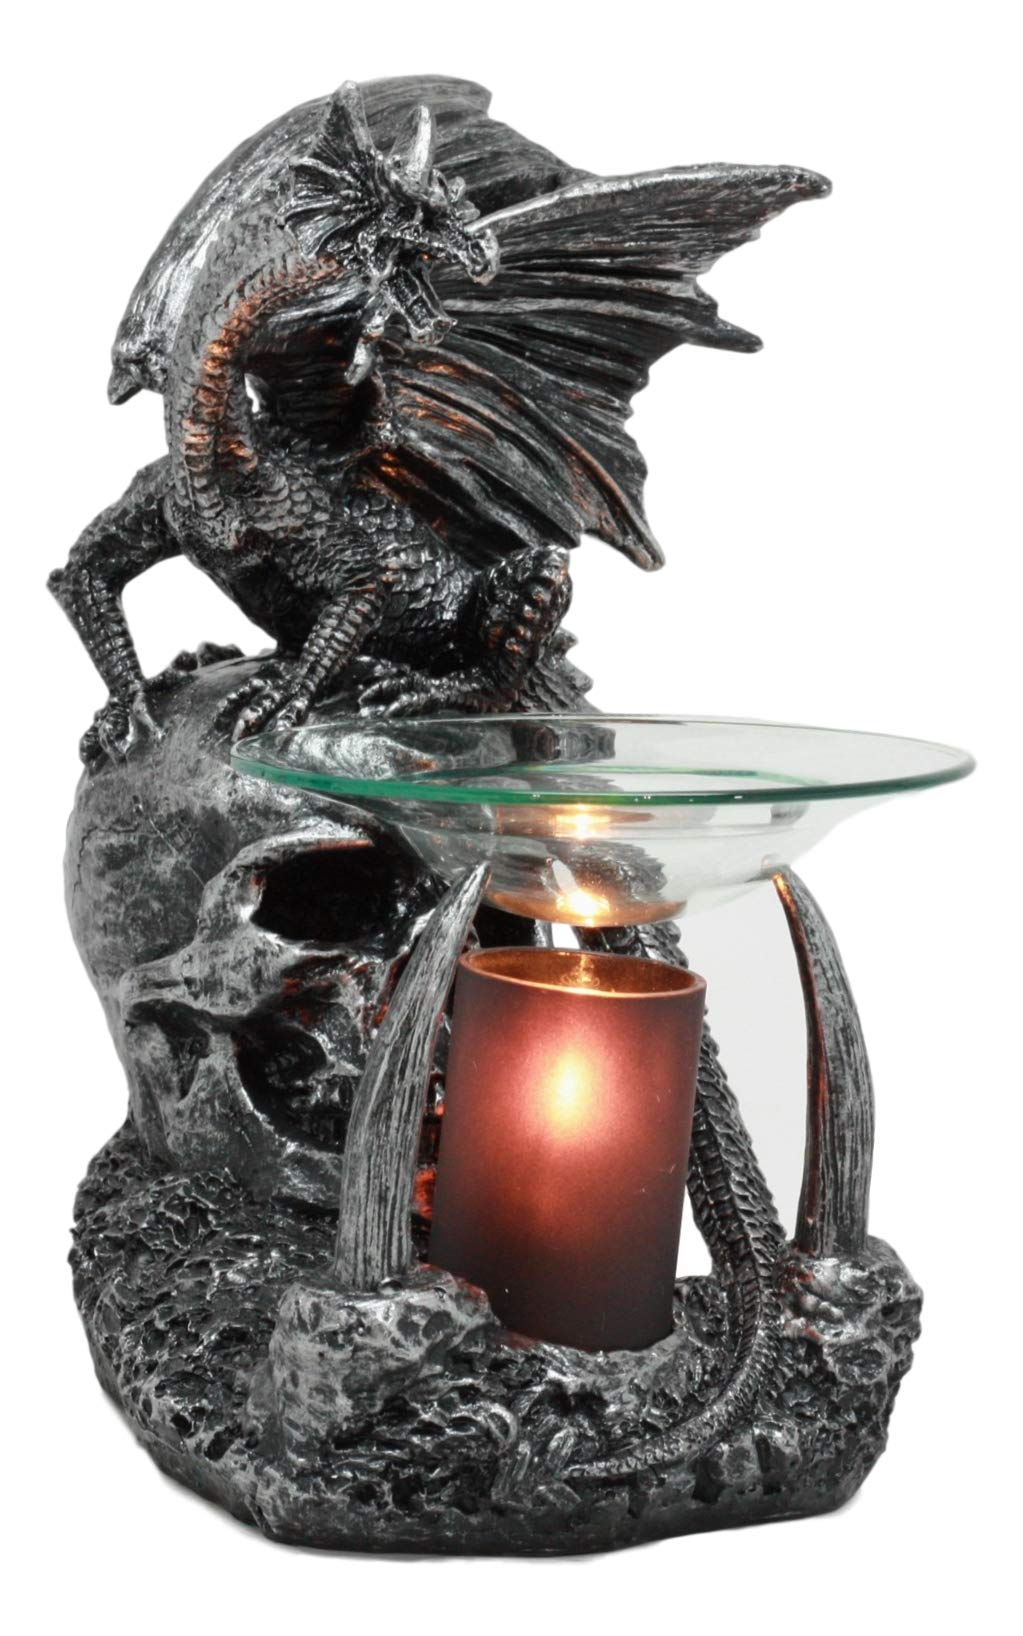 Ebros Gothic Sabretooth Skull Graveyard Dragon Electric Oil Burner Or Tart Warmer Decor Statue 8 5 Tall Home Fragrance Aroma Accessory Figurine Buy Online In Botswana At Botswana Desertcart Com Productid 96465604